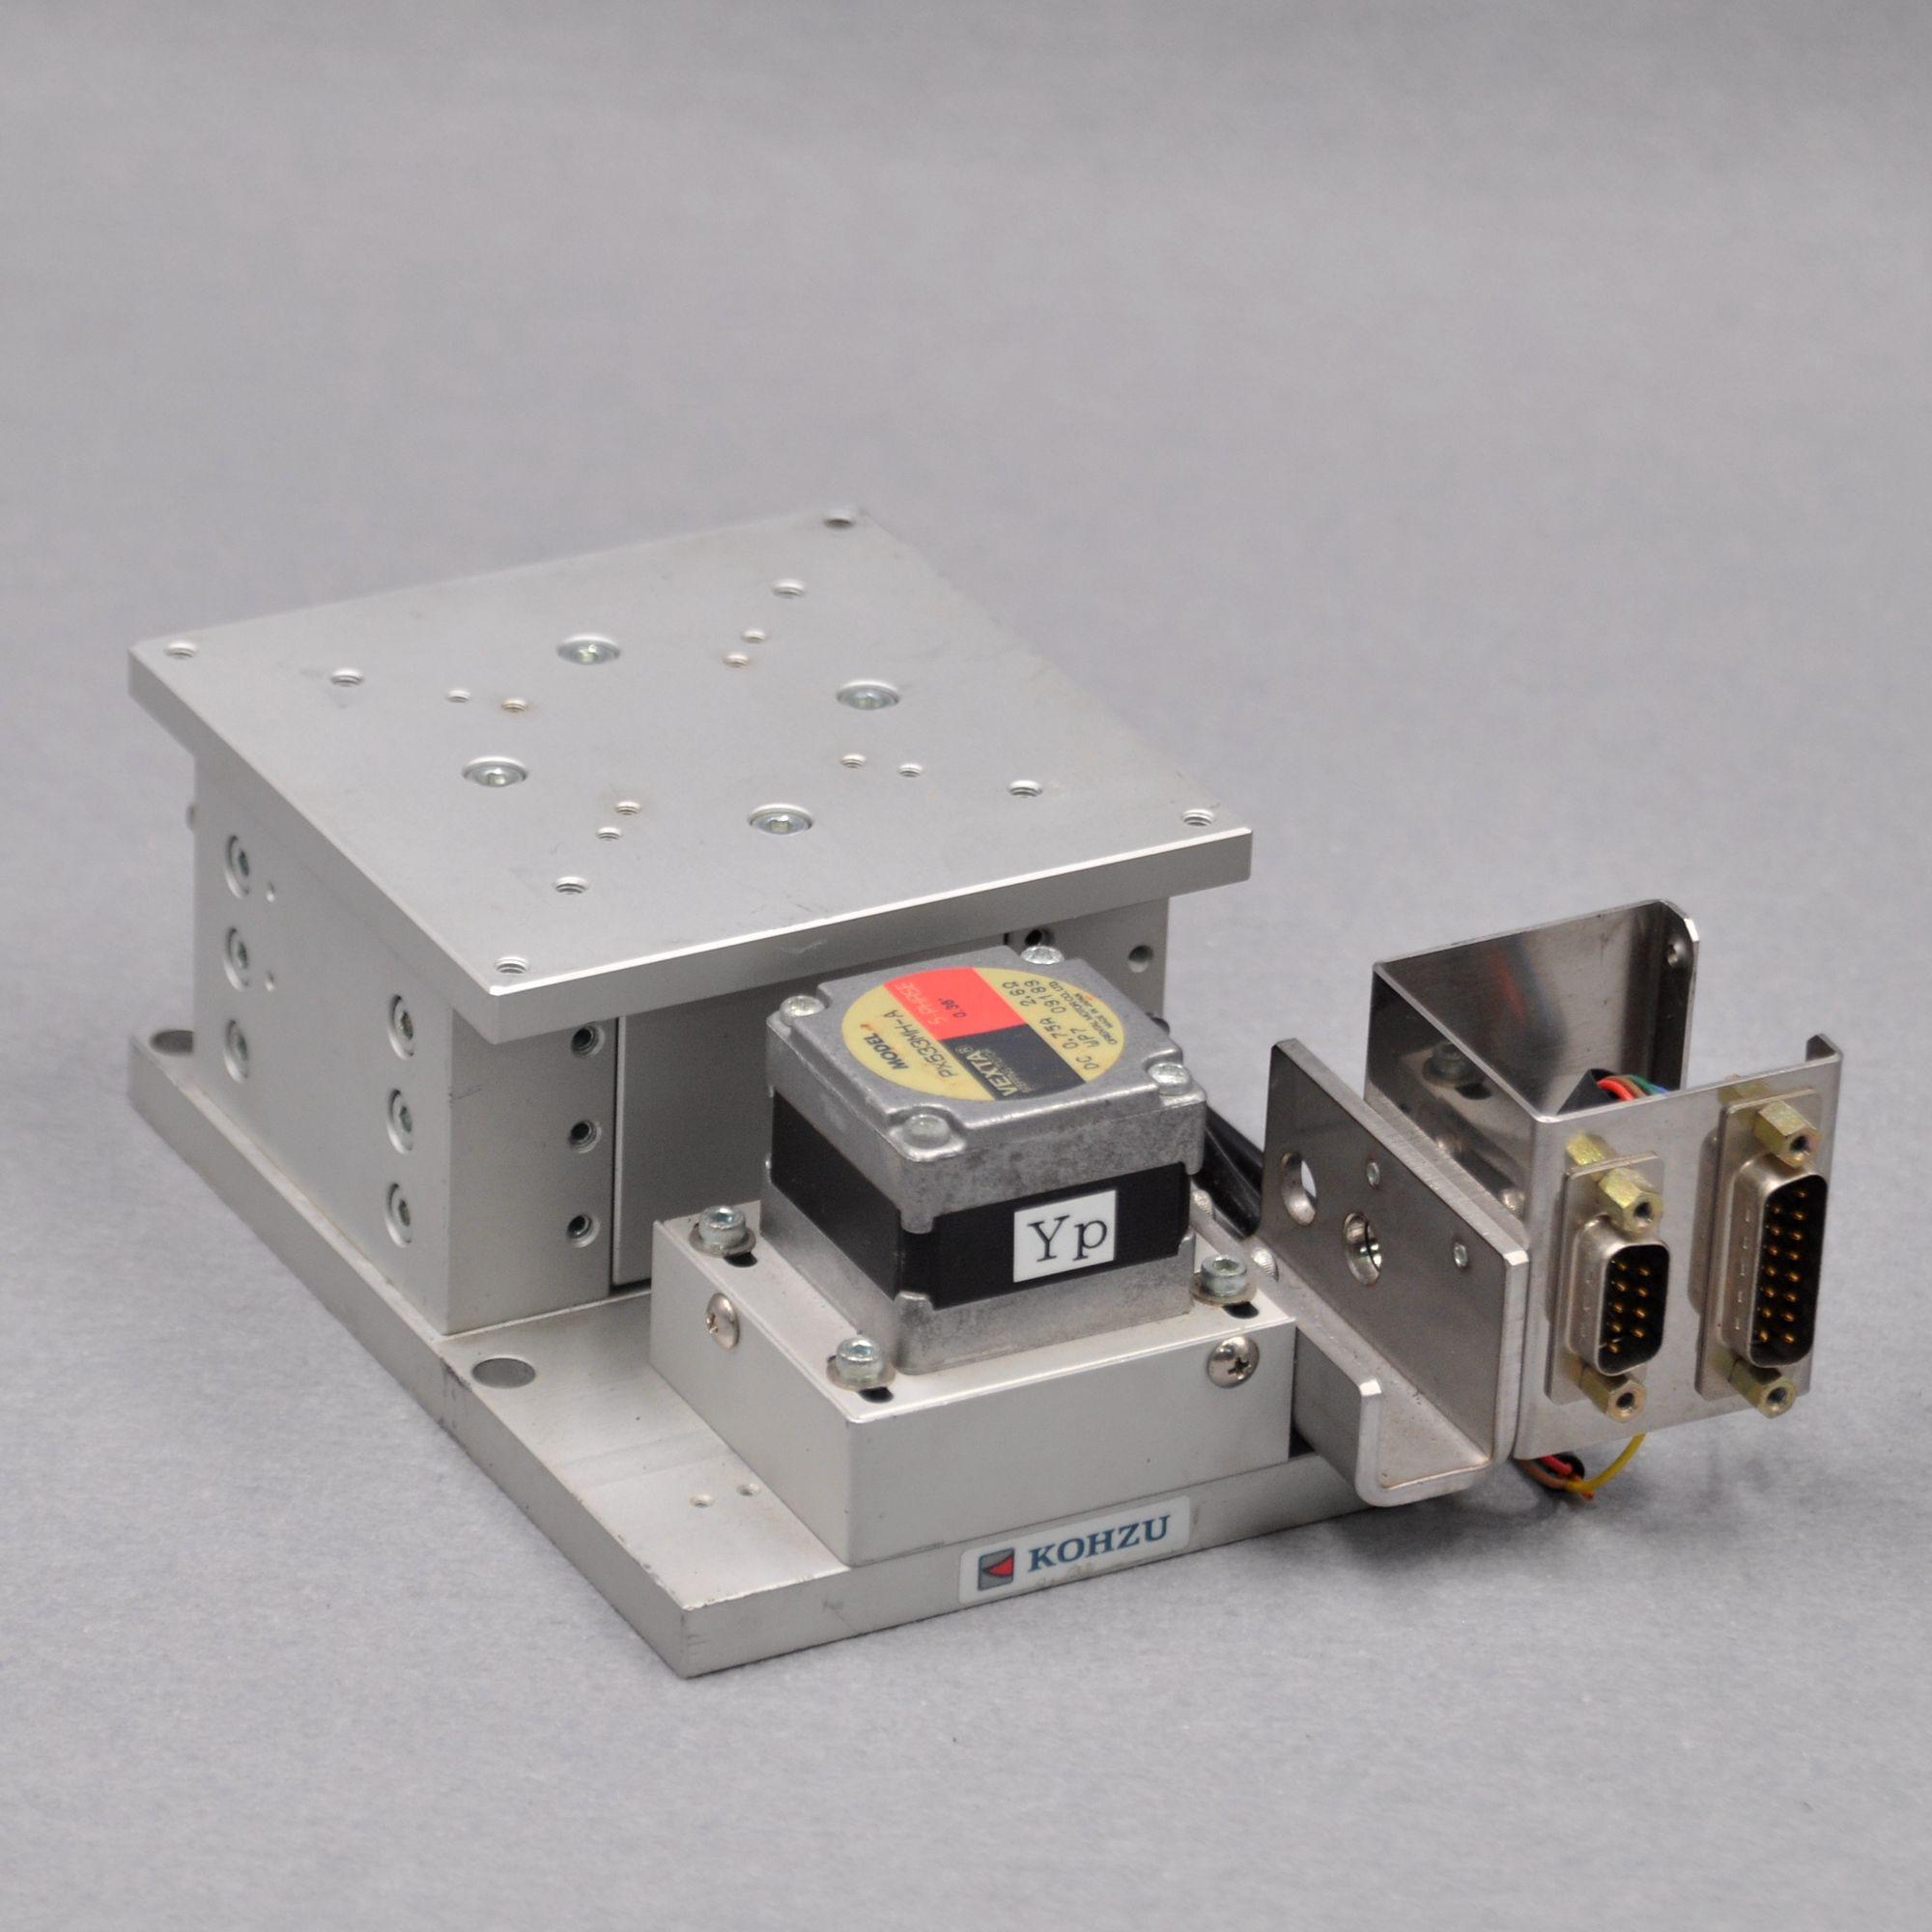 Z axis ZA10-12 Kozu Seiki optical electric precision lifting fine adjustment slide table 100 * 100mm stroke 12mm